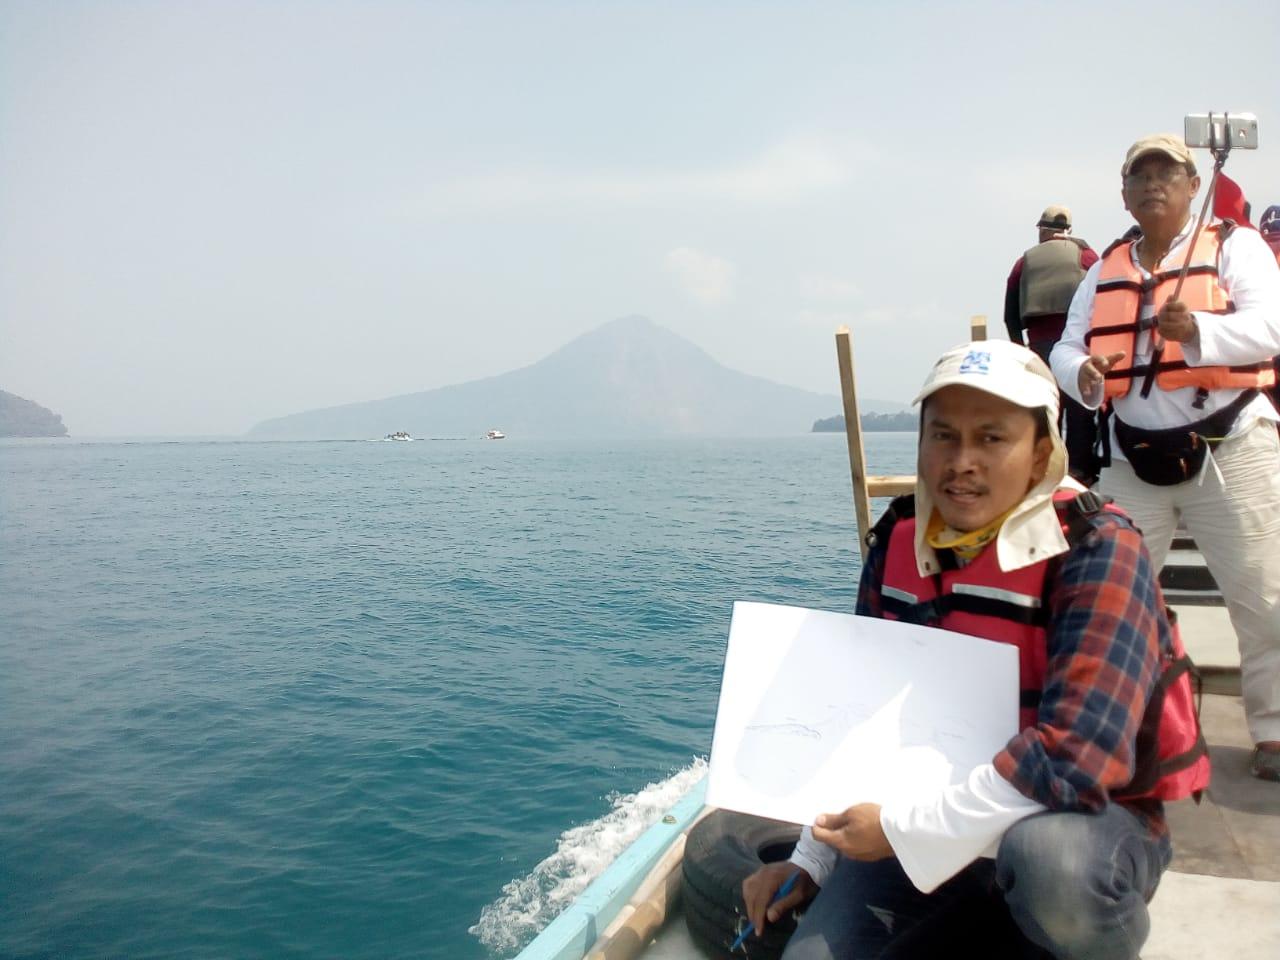 empat-kemungkinan-terjadinya-tsunami-di-selat-sunda-menurut-volkanolog-itb